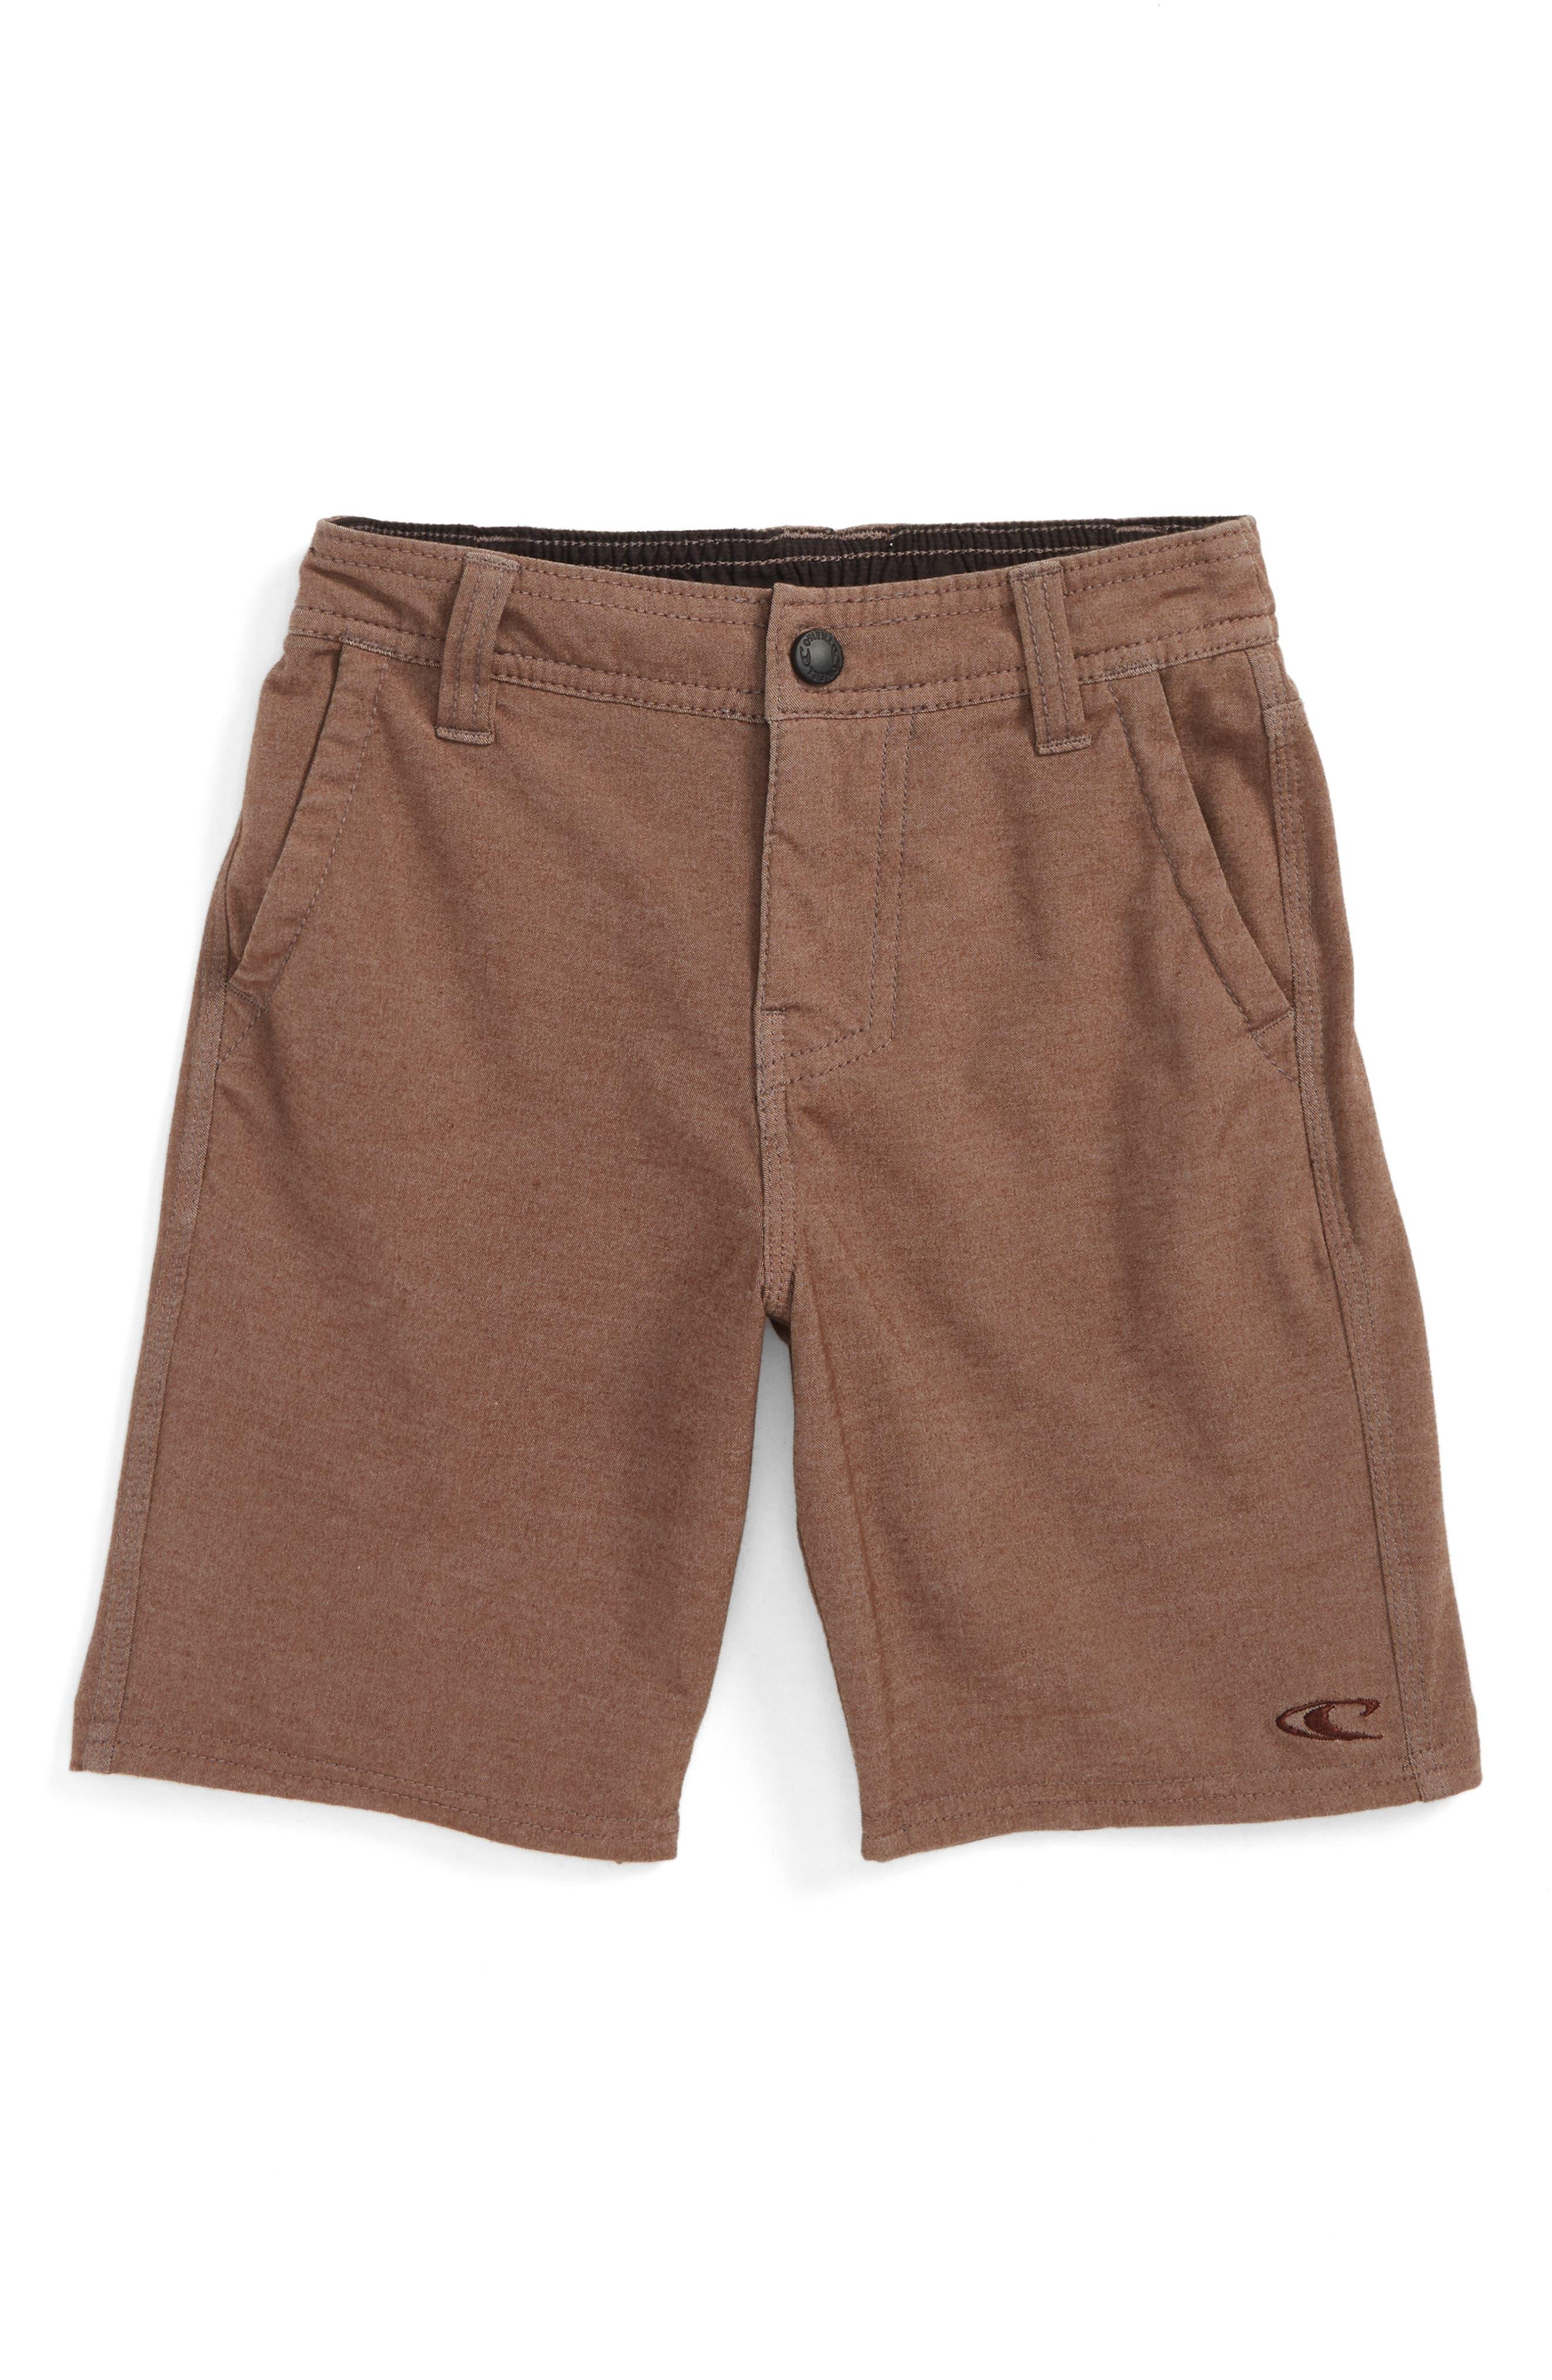 Alternate Image 1 Selected - O'Neill Locked Hybrid Board Shorts (Little Boys)